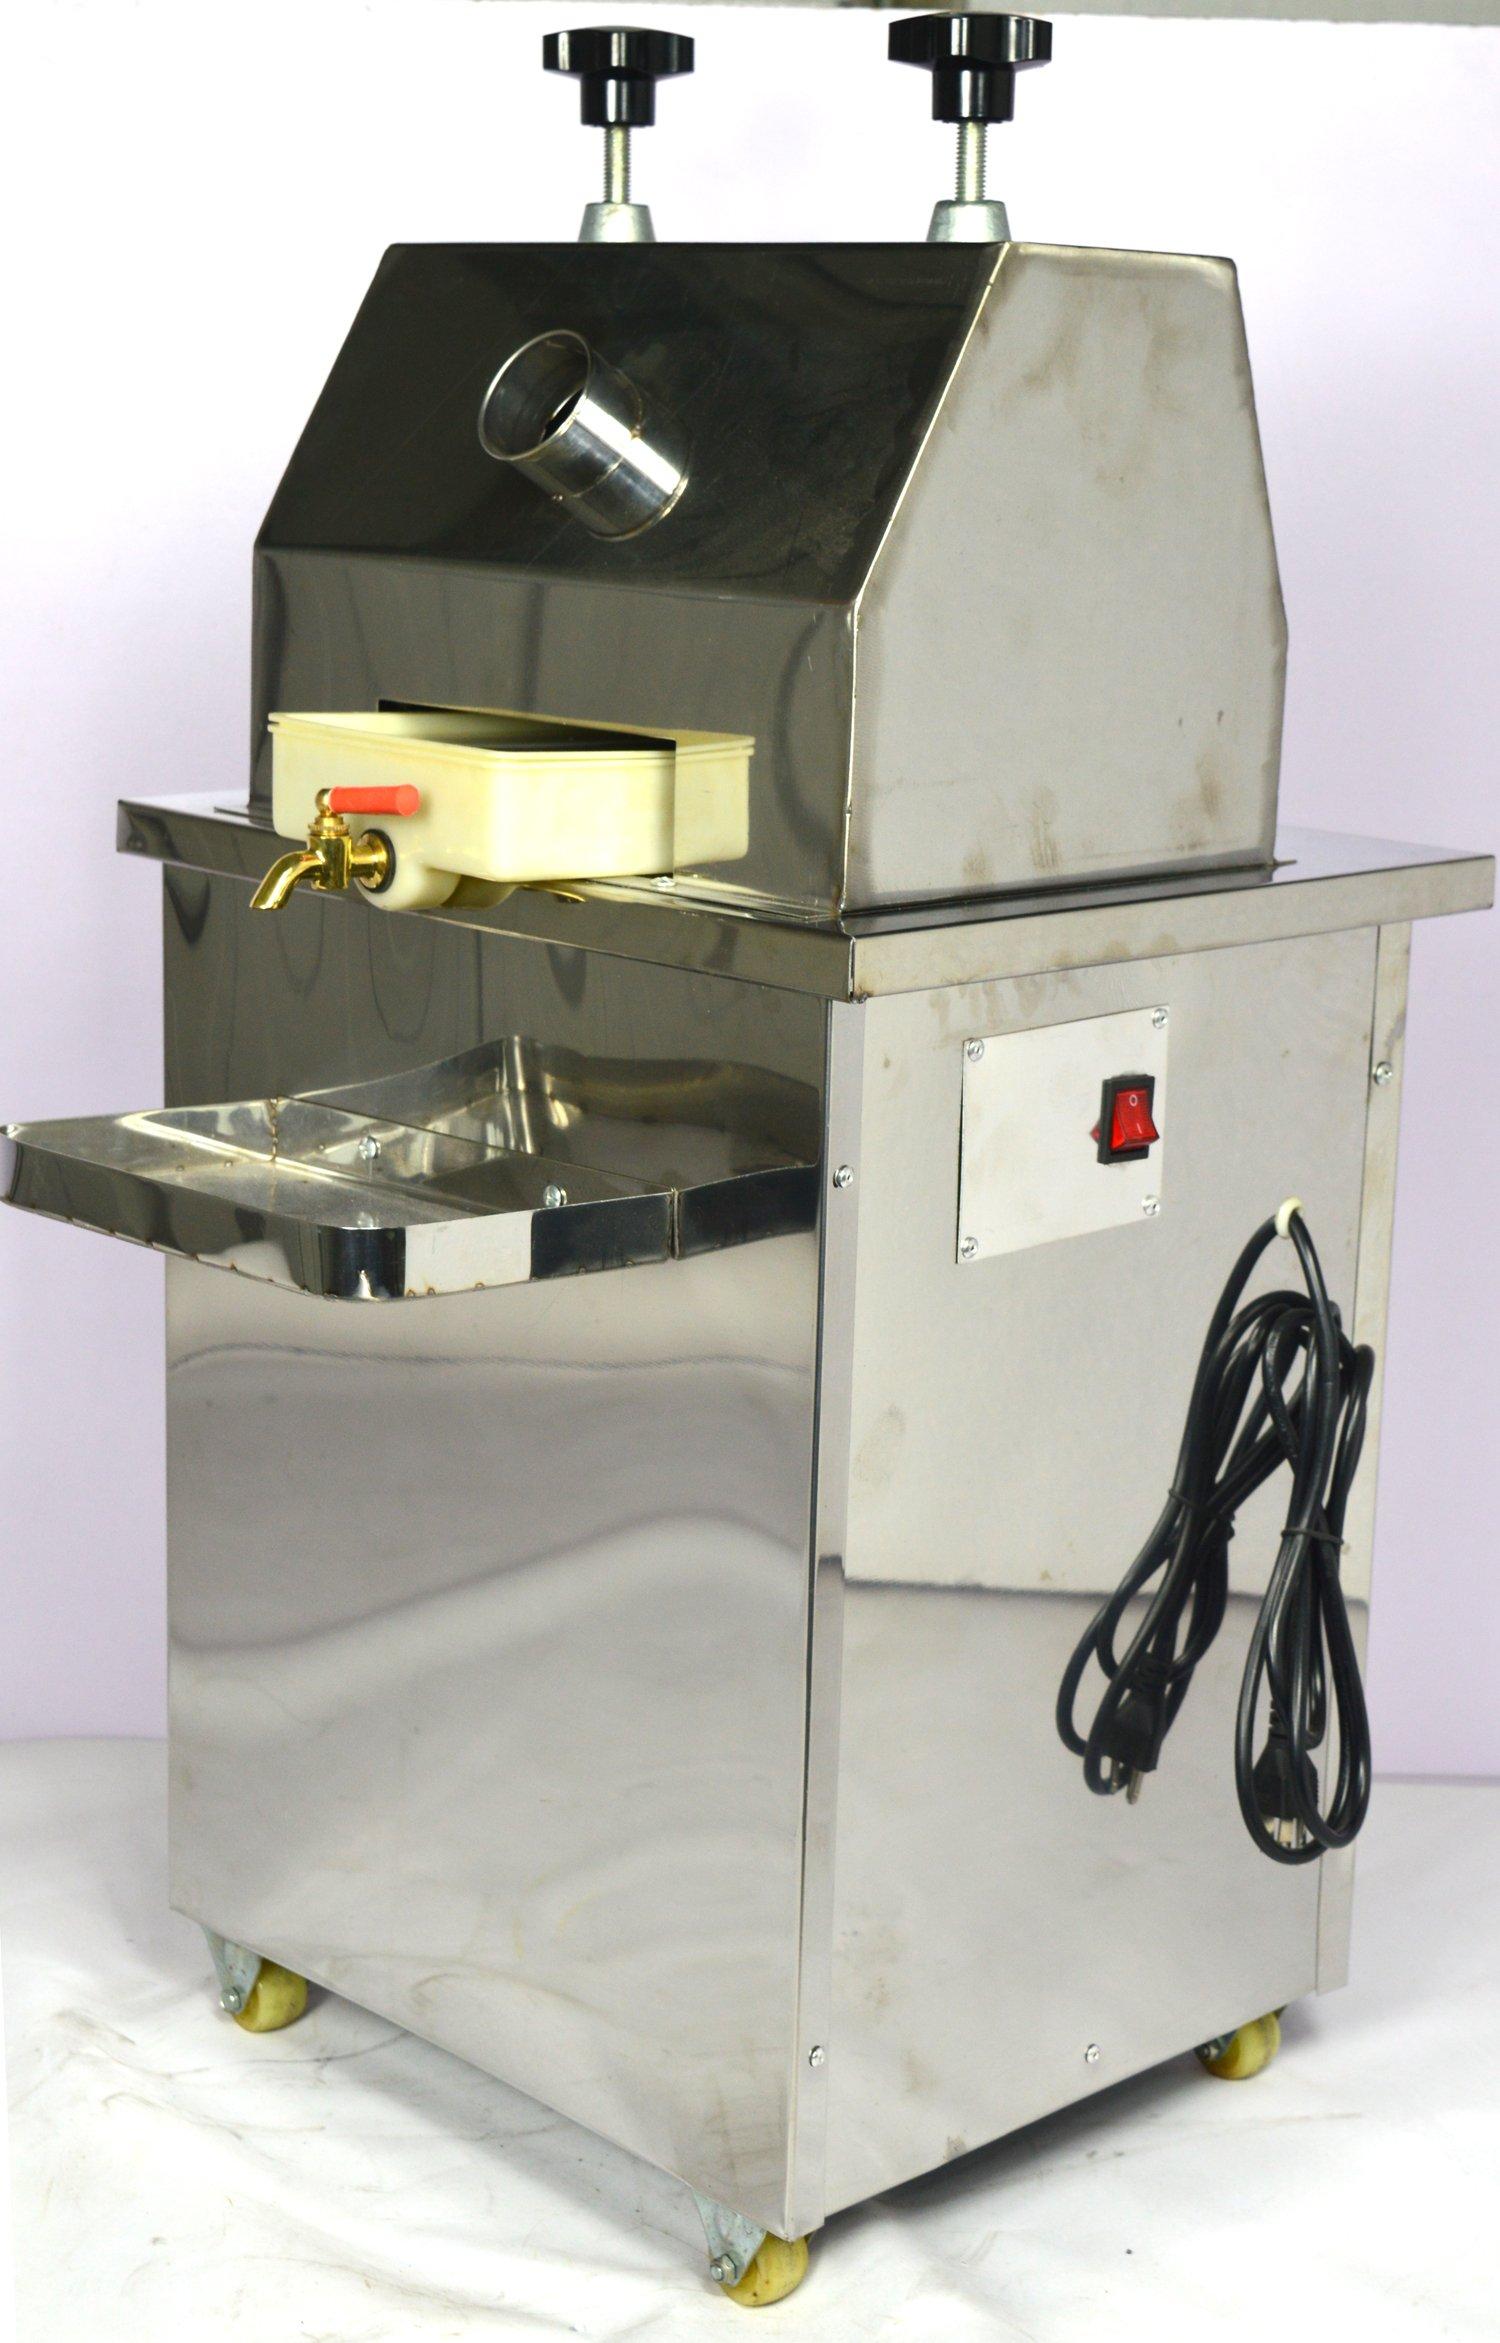 Techtongda Commercial Sugar Cane Juicer Electric Sugar Cane Press JuicerThree Rolls 126LB #134027